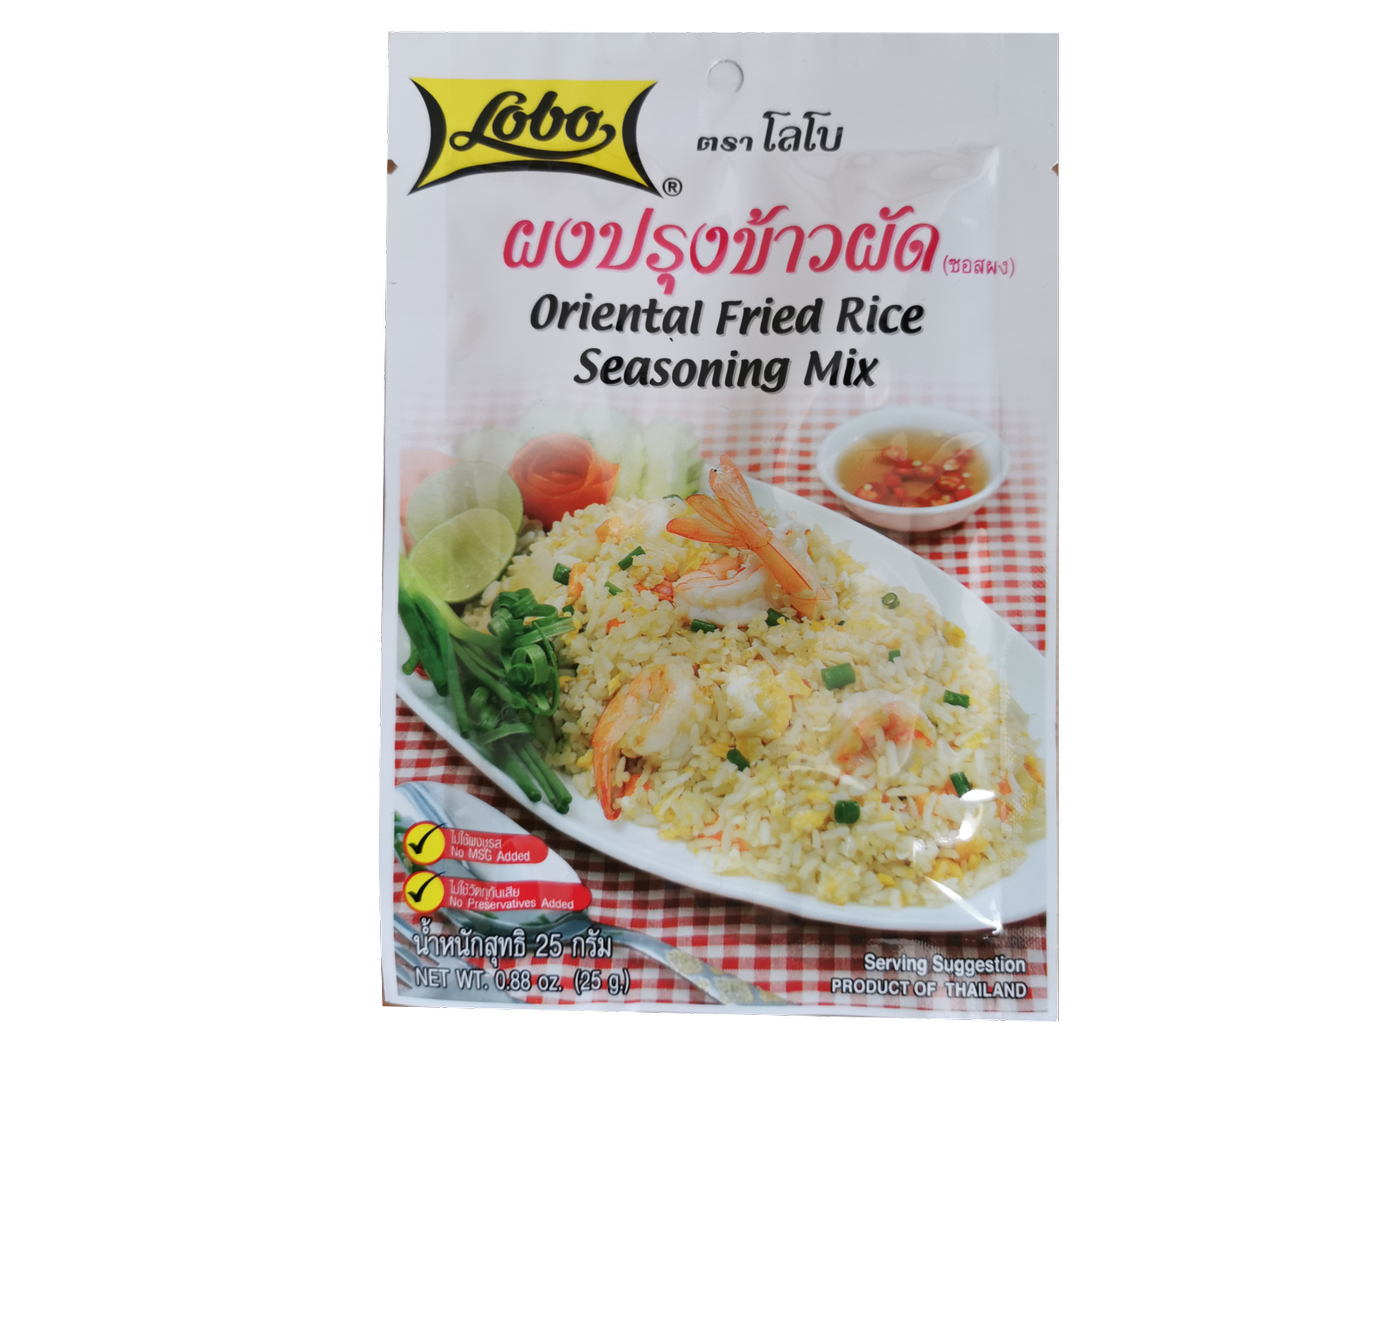 Lobo Oriental Fried Rice Seasoning Mix